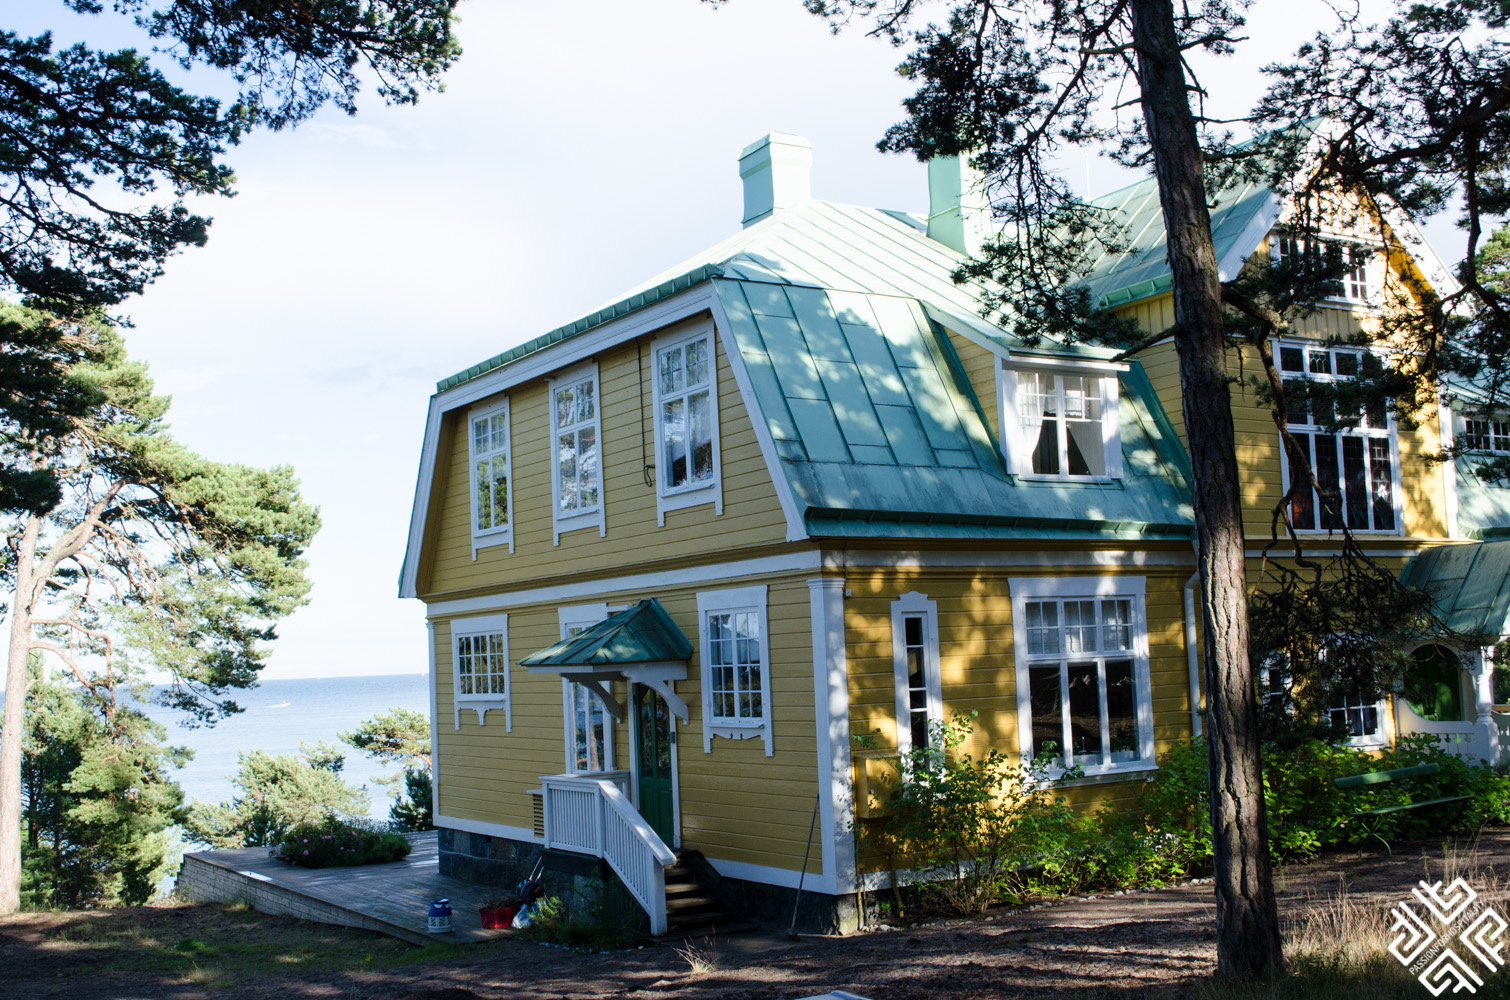 stockholm_archipelago_sandhamn-6